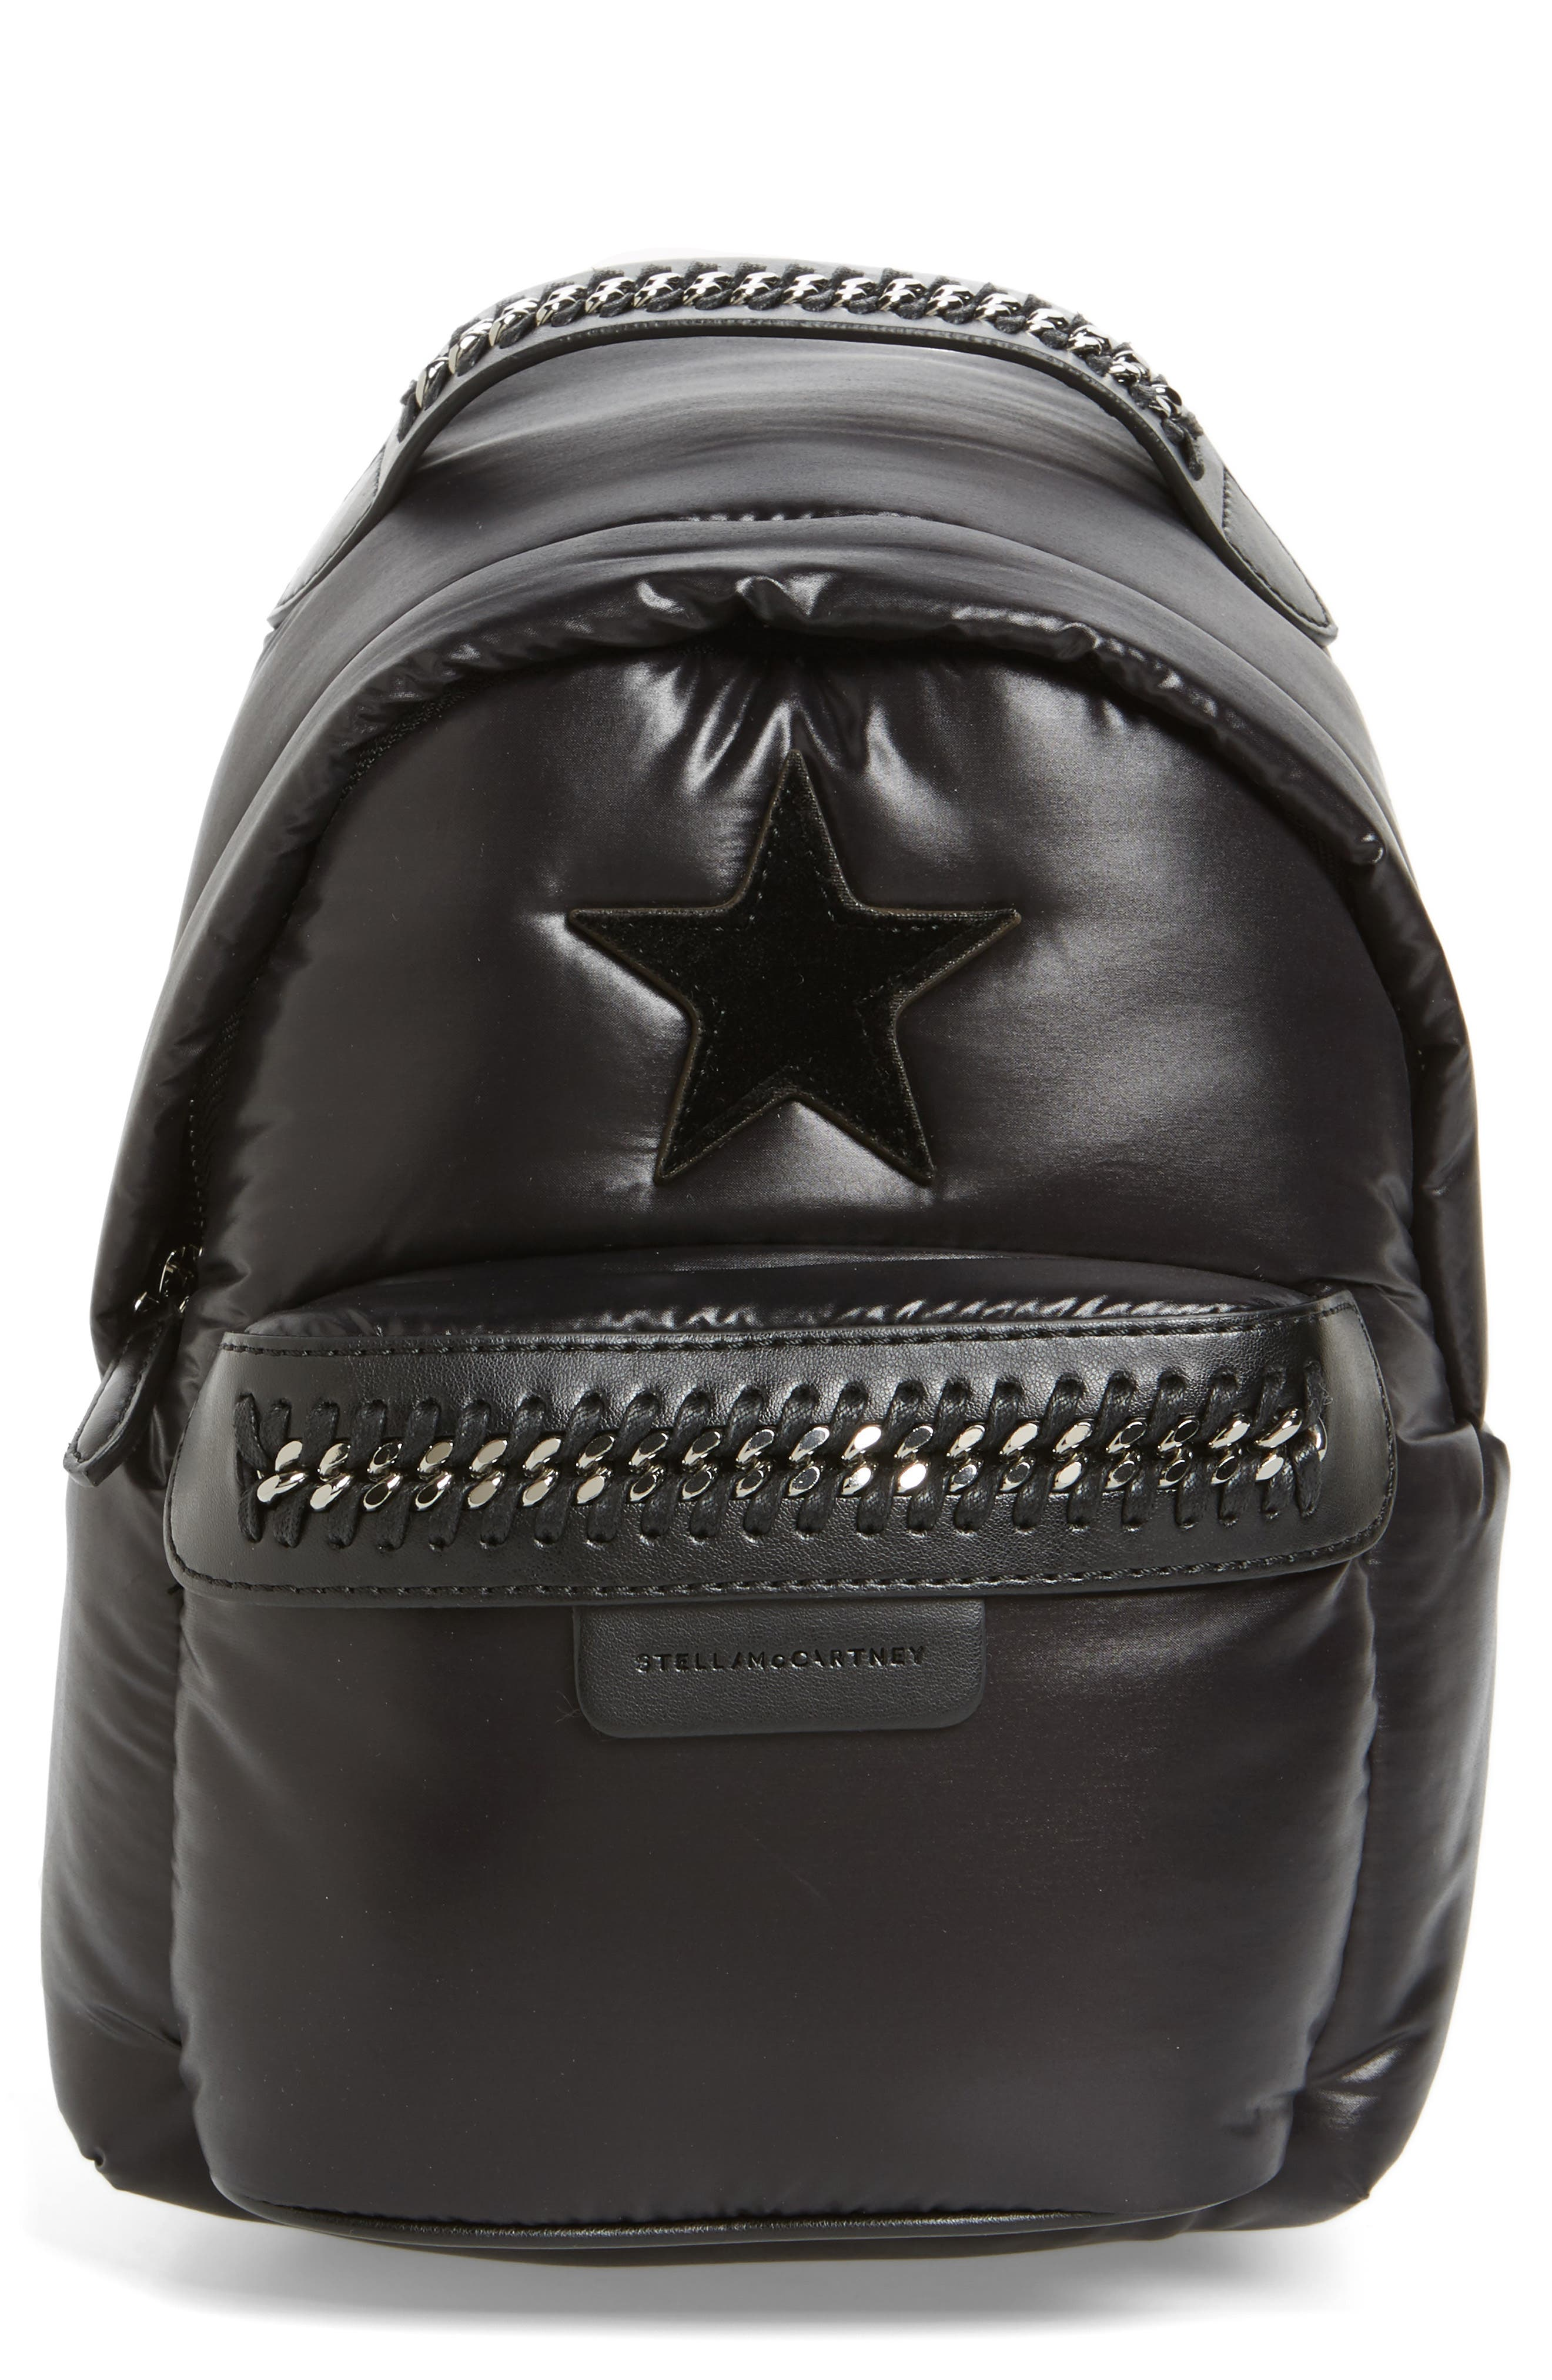 Stella McCartney Mini Falabella Go Star Backpack